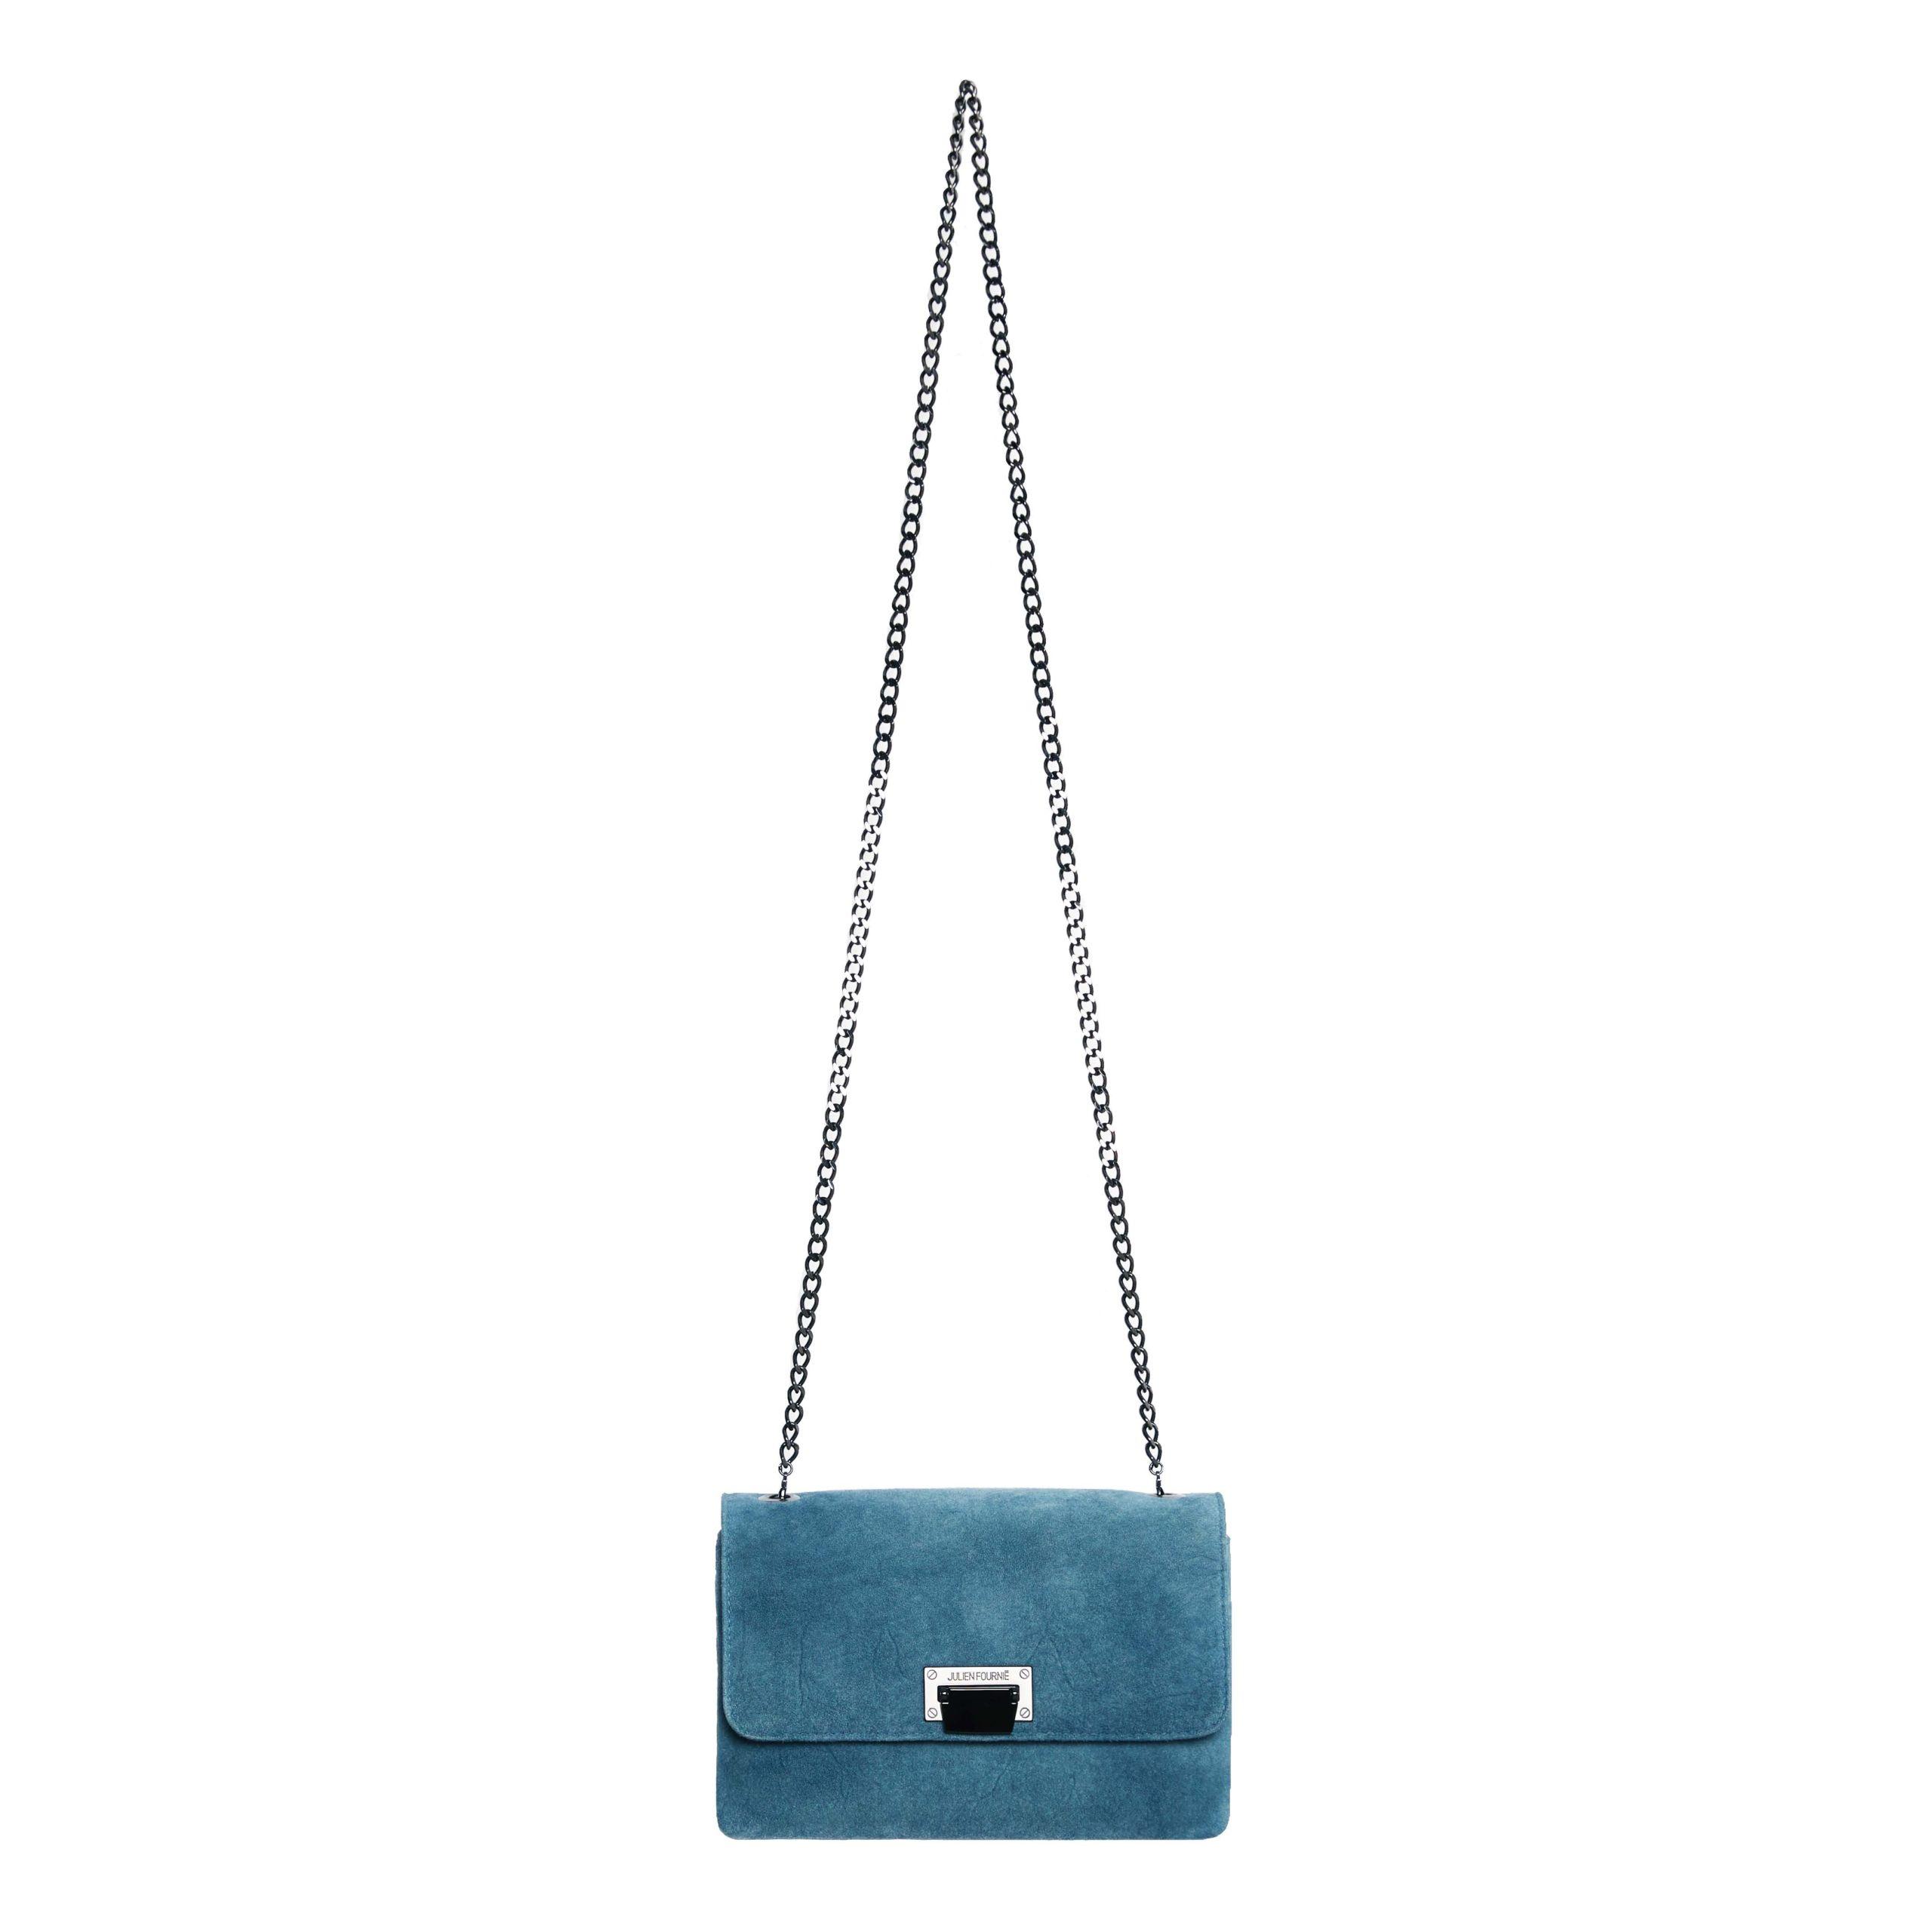 Stormy Handbag